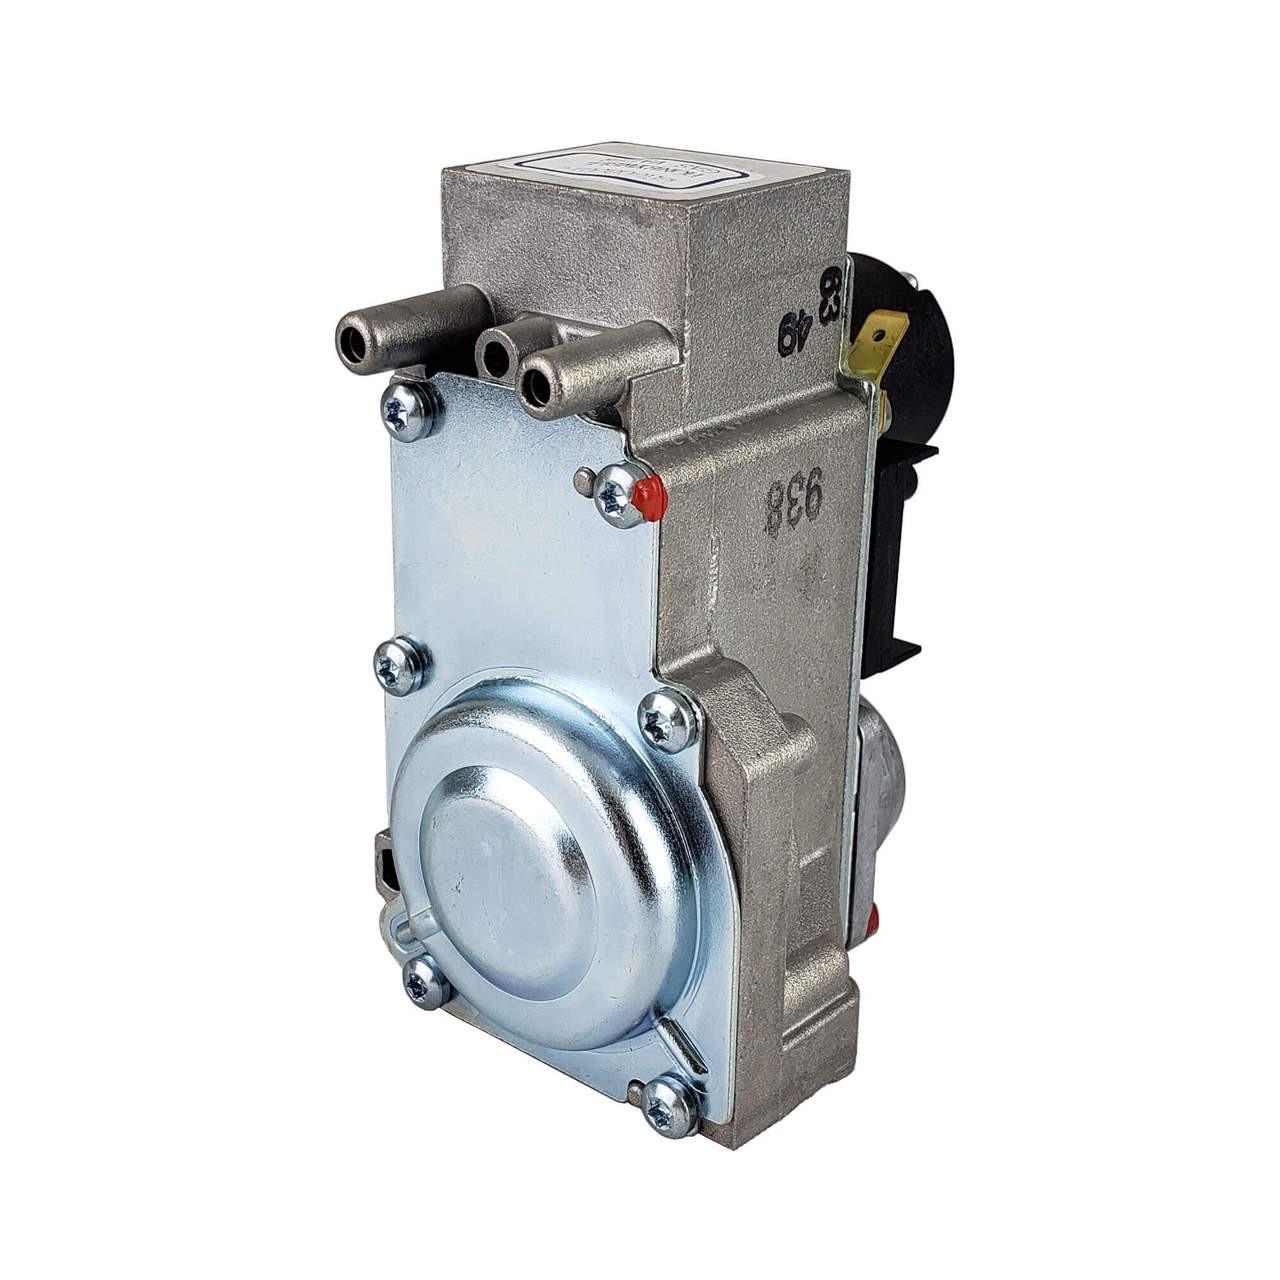 Bromic gas valve plate view